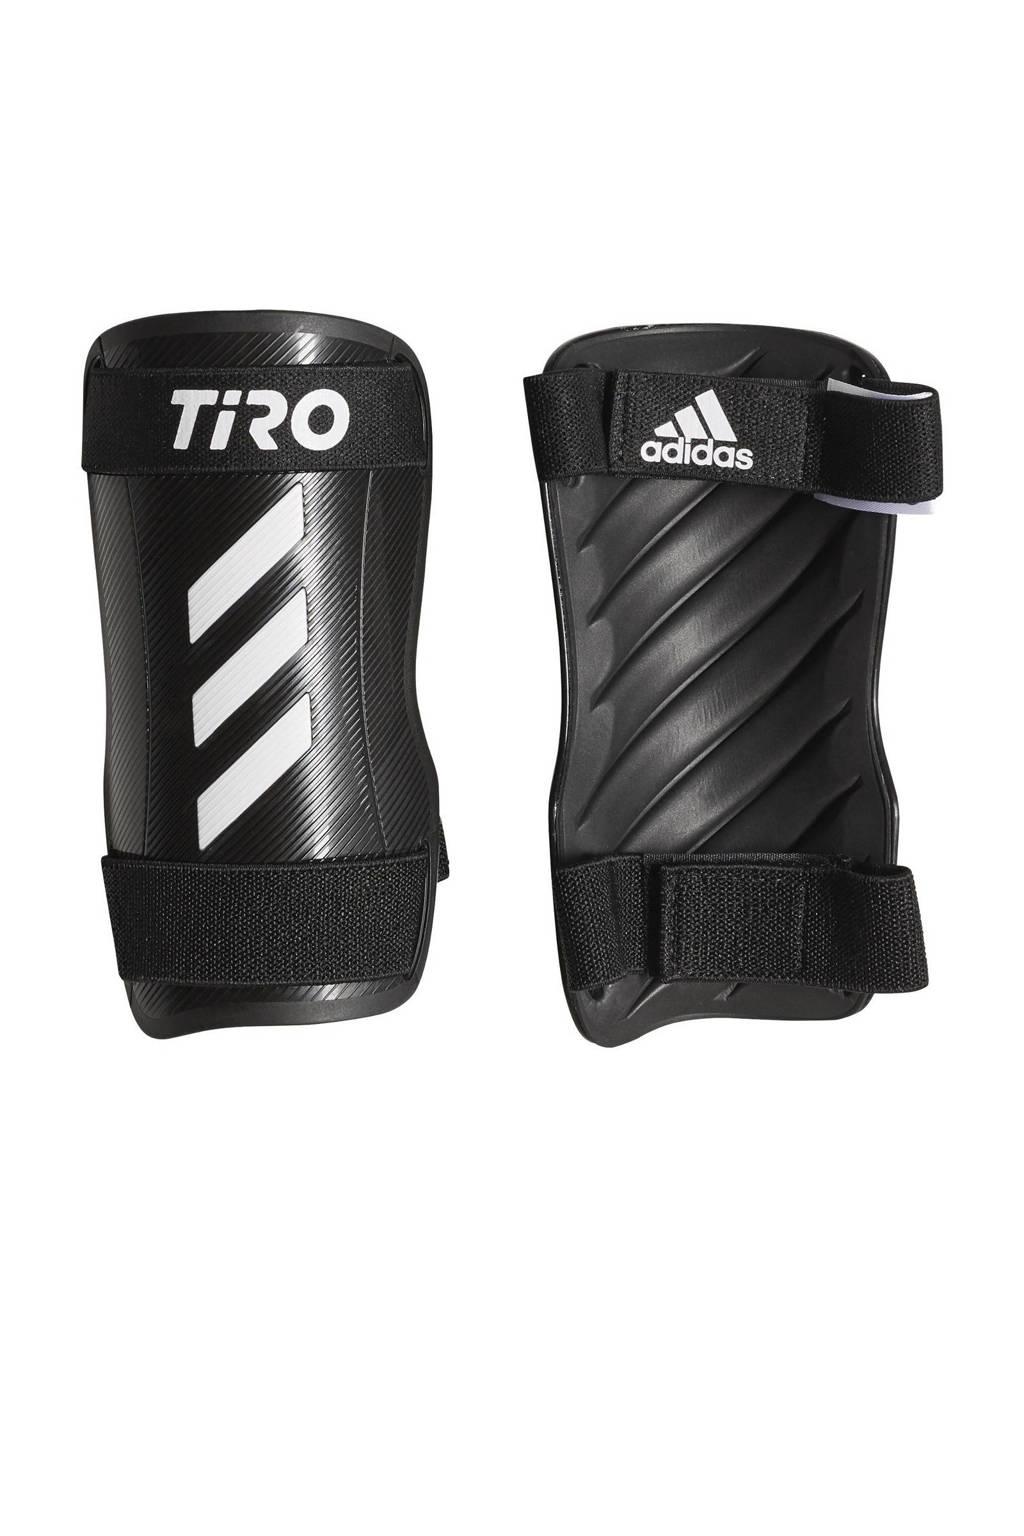 adidas Performance   Tiro Training scheenbeschermers wit/zwart, Wit/zwart